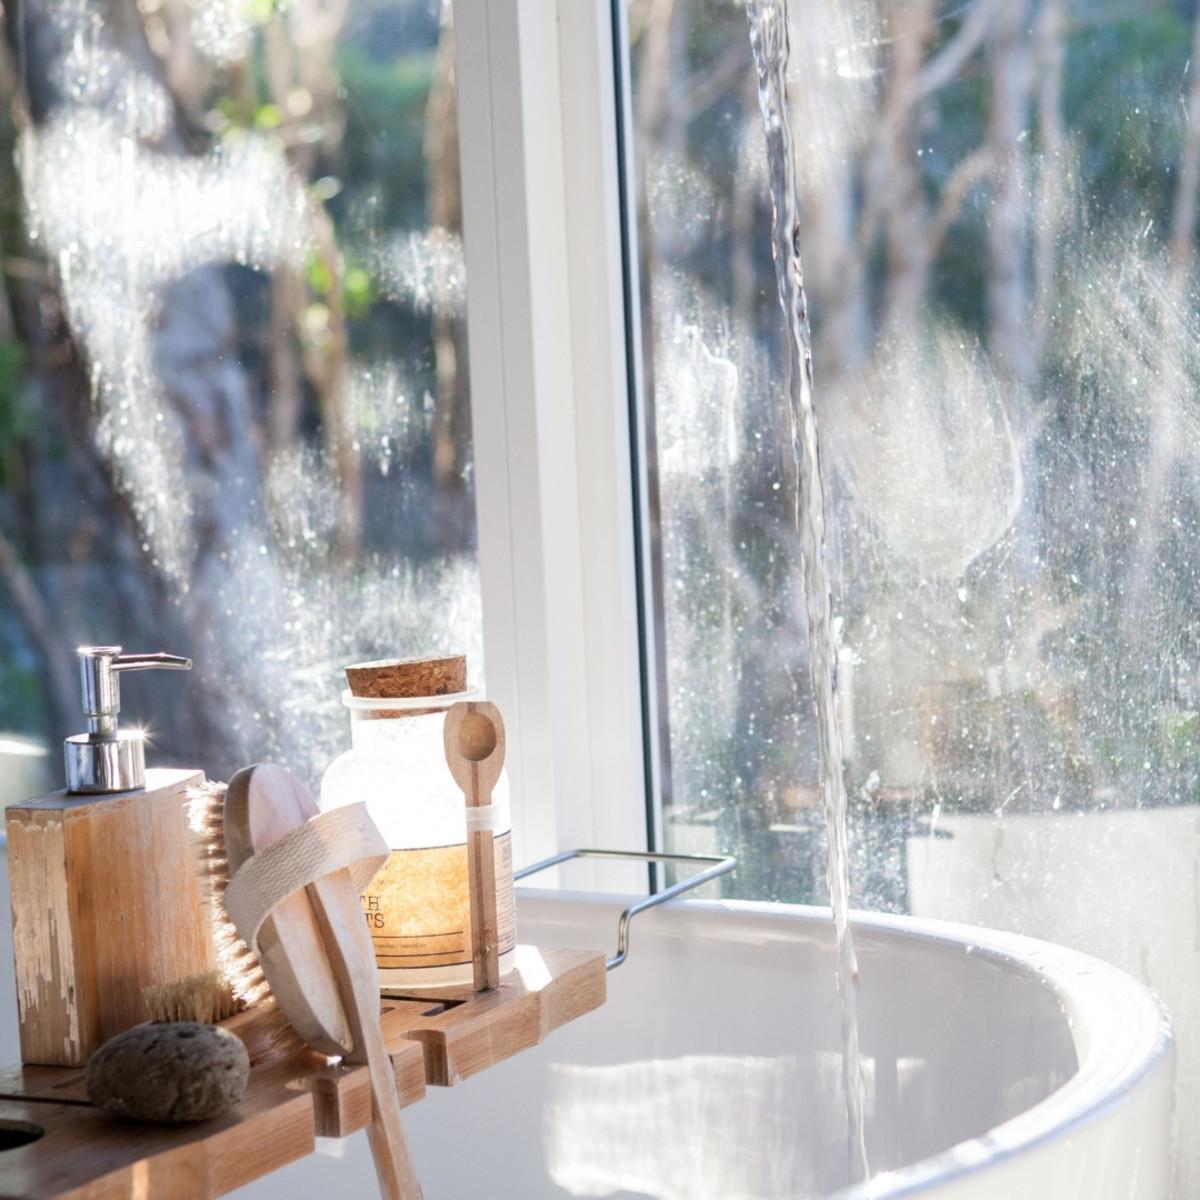 Paper yourself with this moisturizing, exfoliating Dead Sea salt scrub recipe!